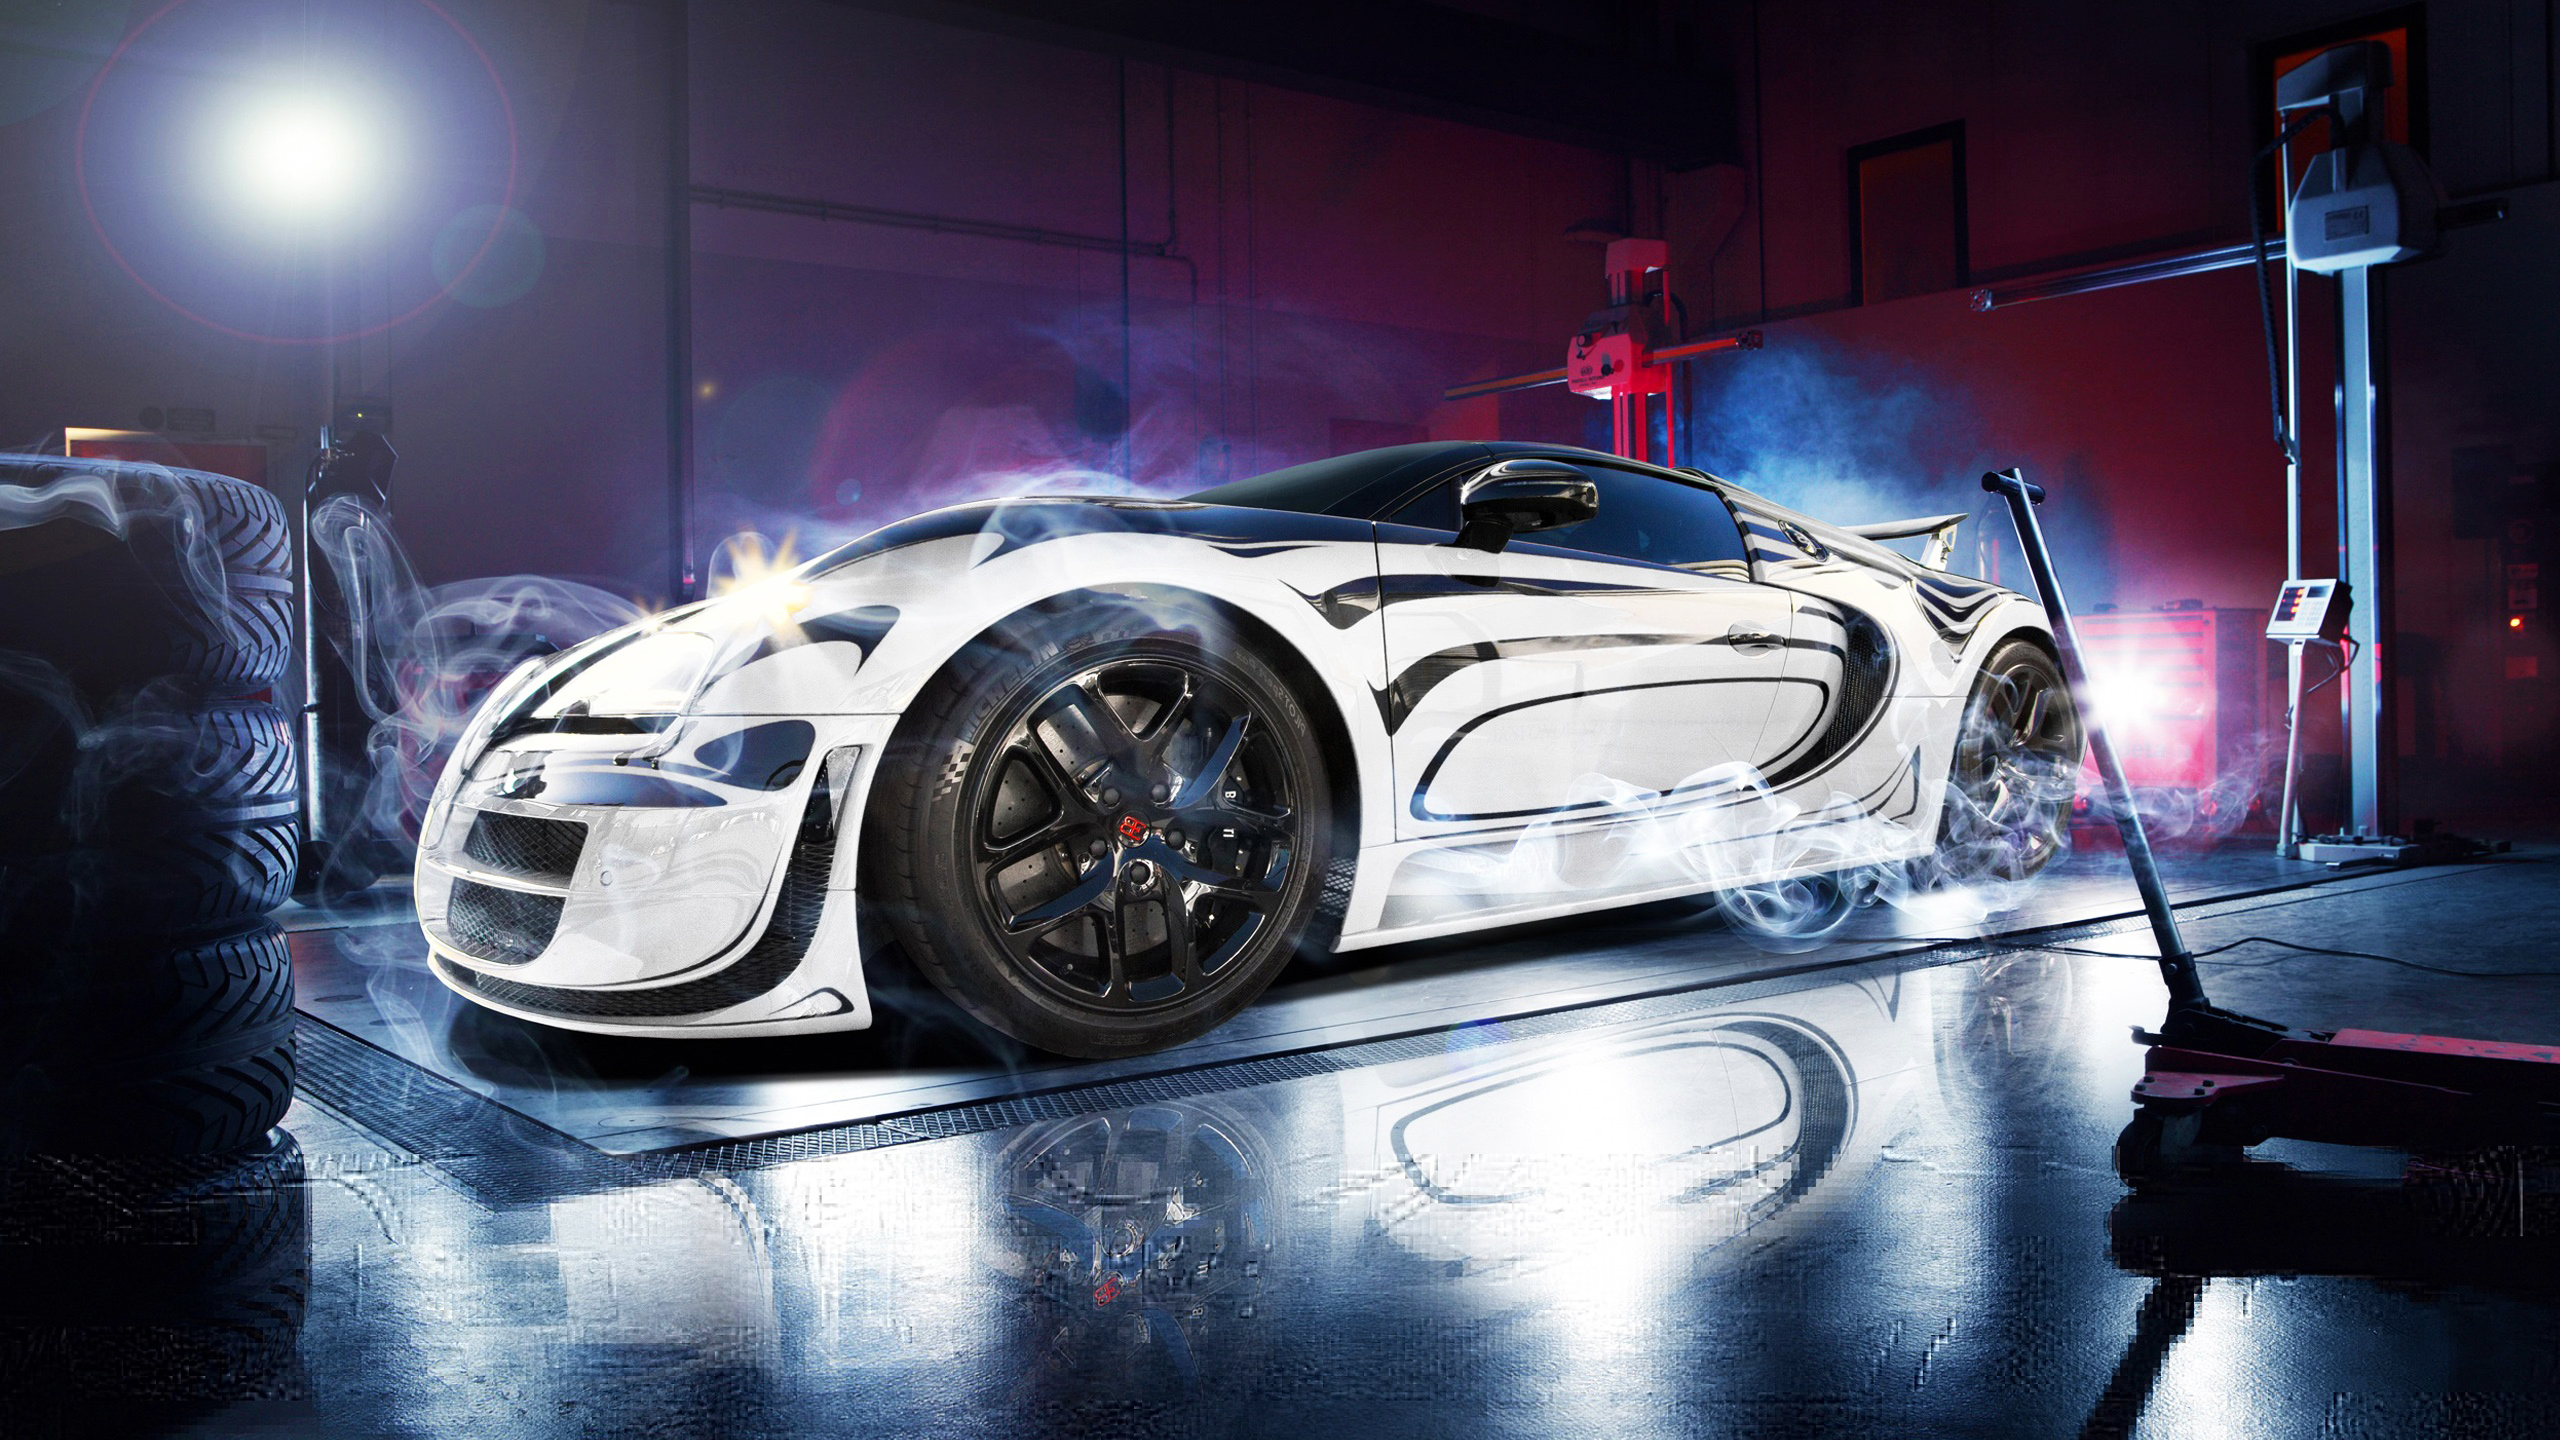 downloadfiles-wallpapers-2560_1440-bugatti_veyron_super_car_15860